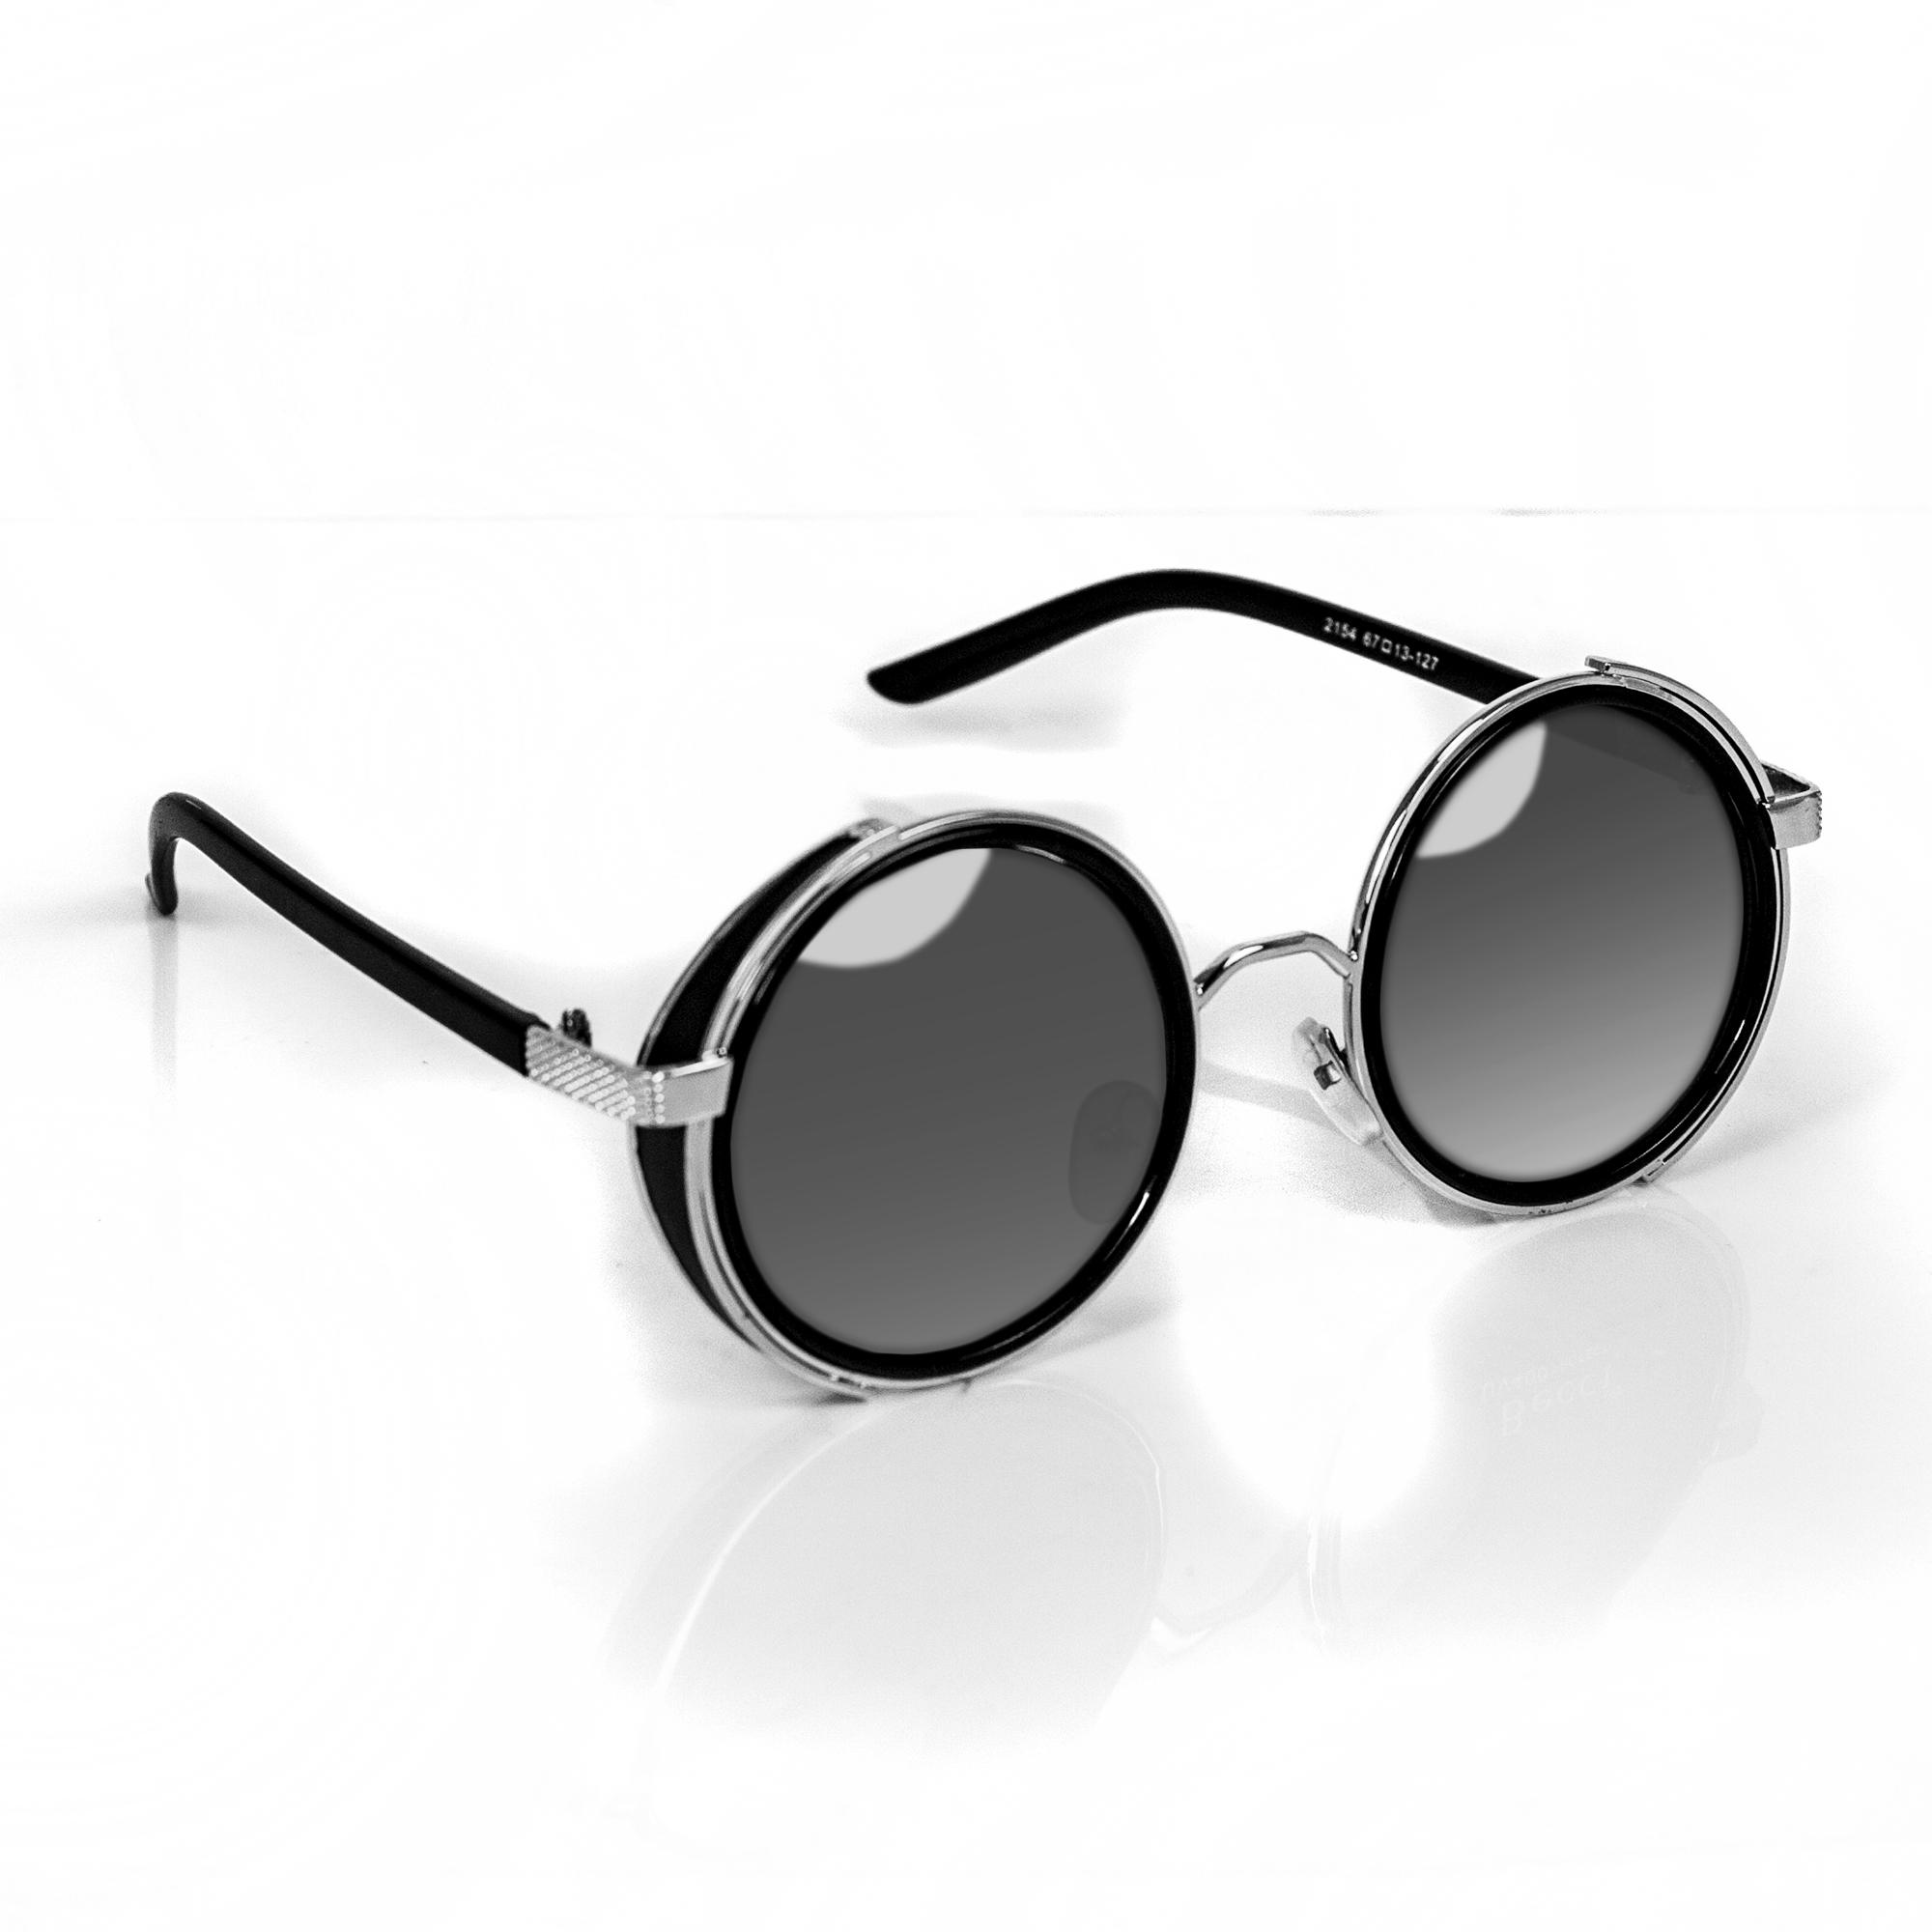 Vintage Retro Sunglasses 32